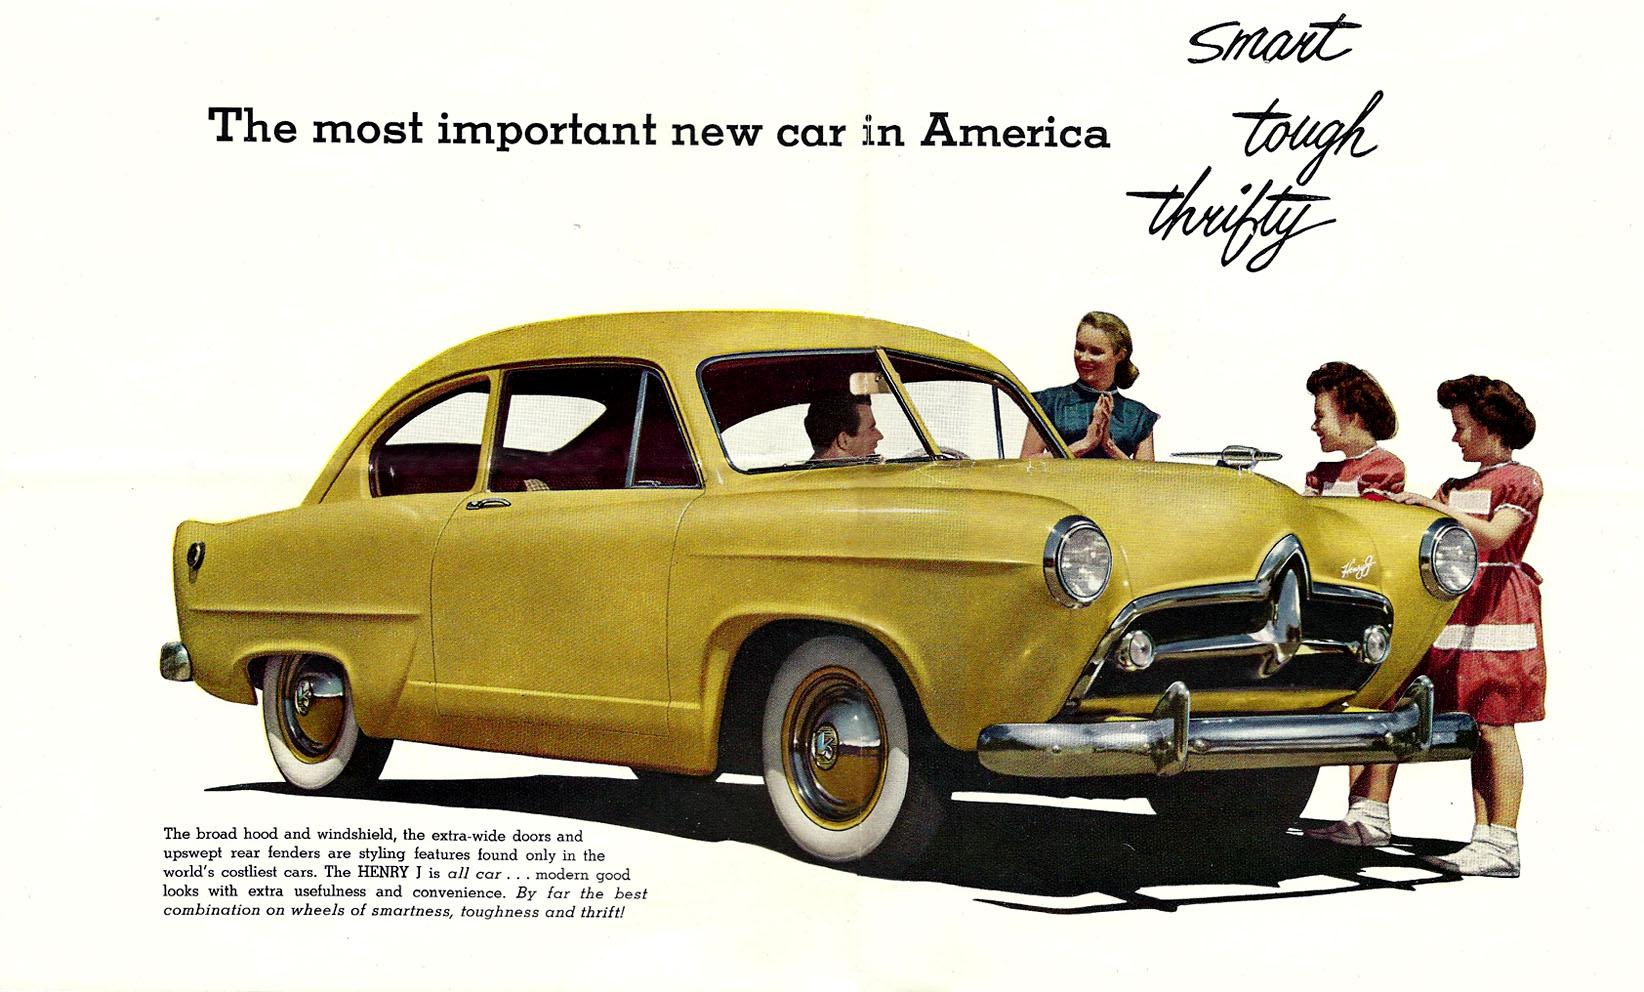 1951 Henry J advertisement